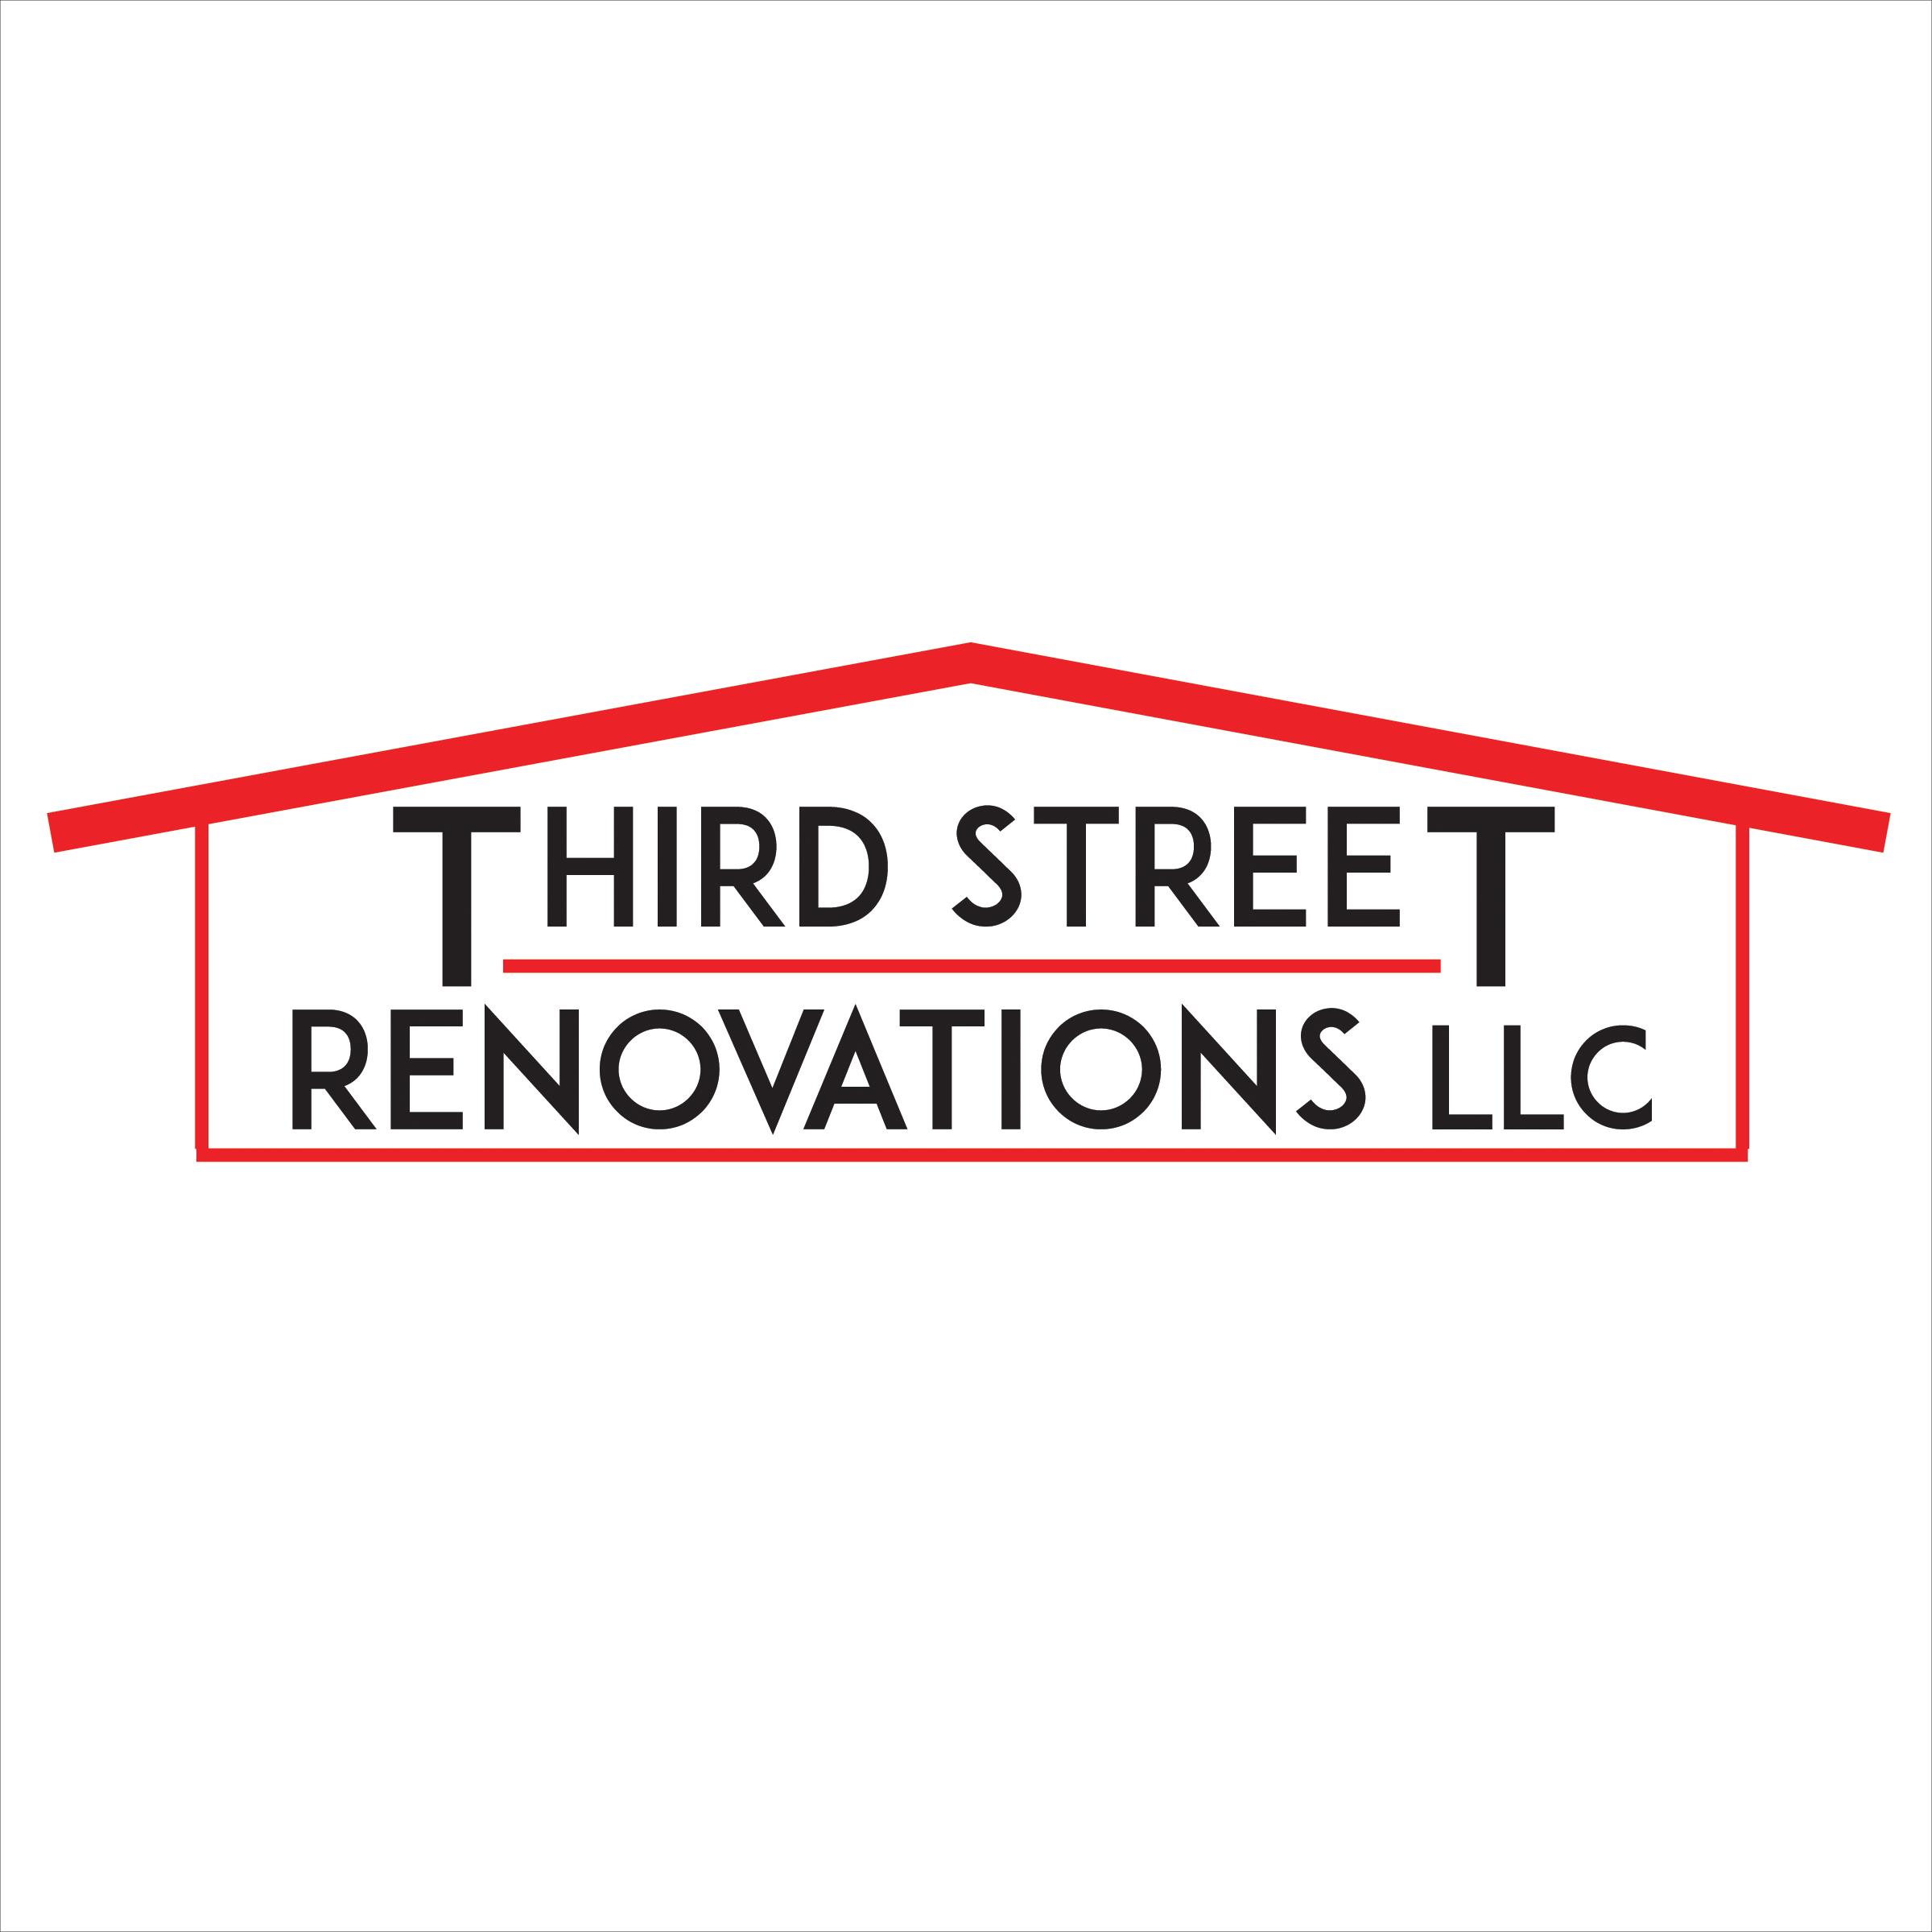 Third Street Renovations